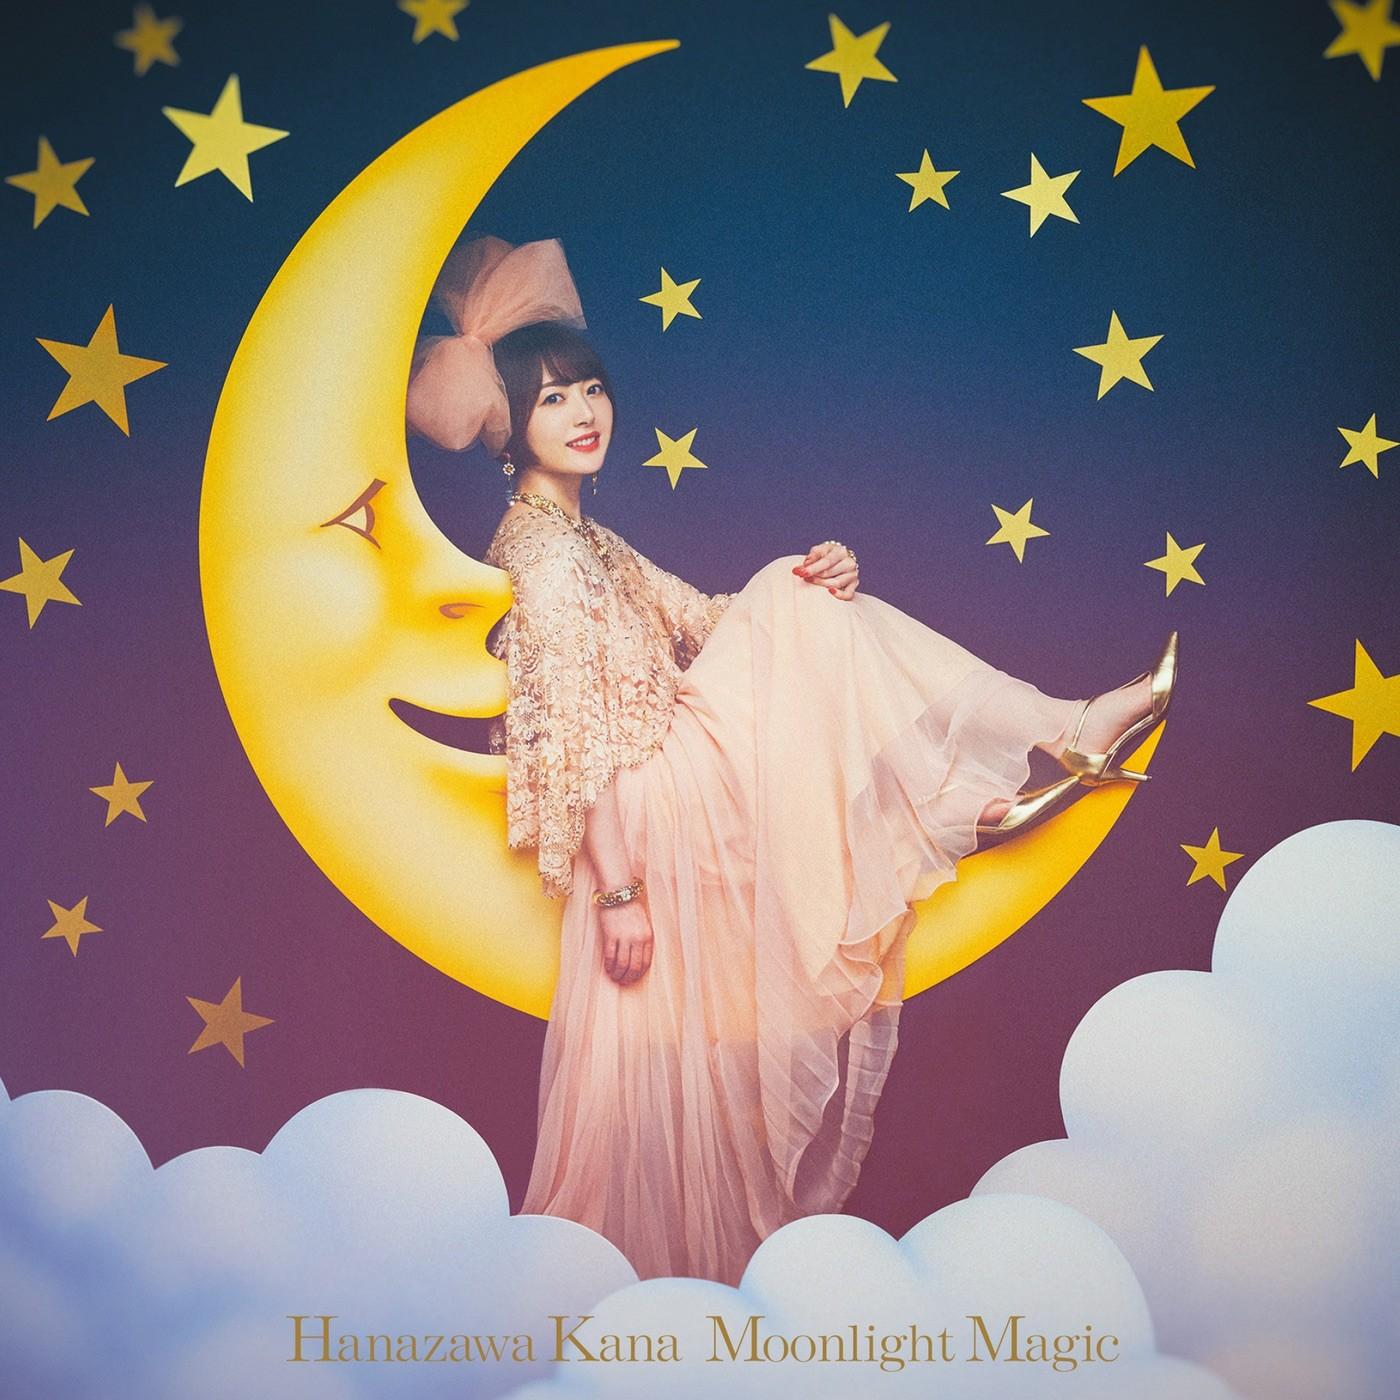 [Single] 花澤香菜 (Kana Hanazawa) – Moonlight Magic (Pre release) [FLAC / 24bit Lossless / WEB] [2021.09.29]